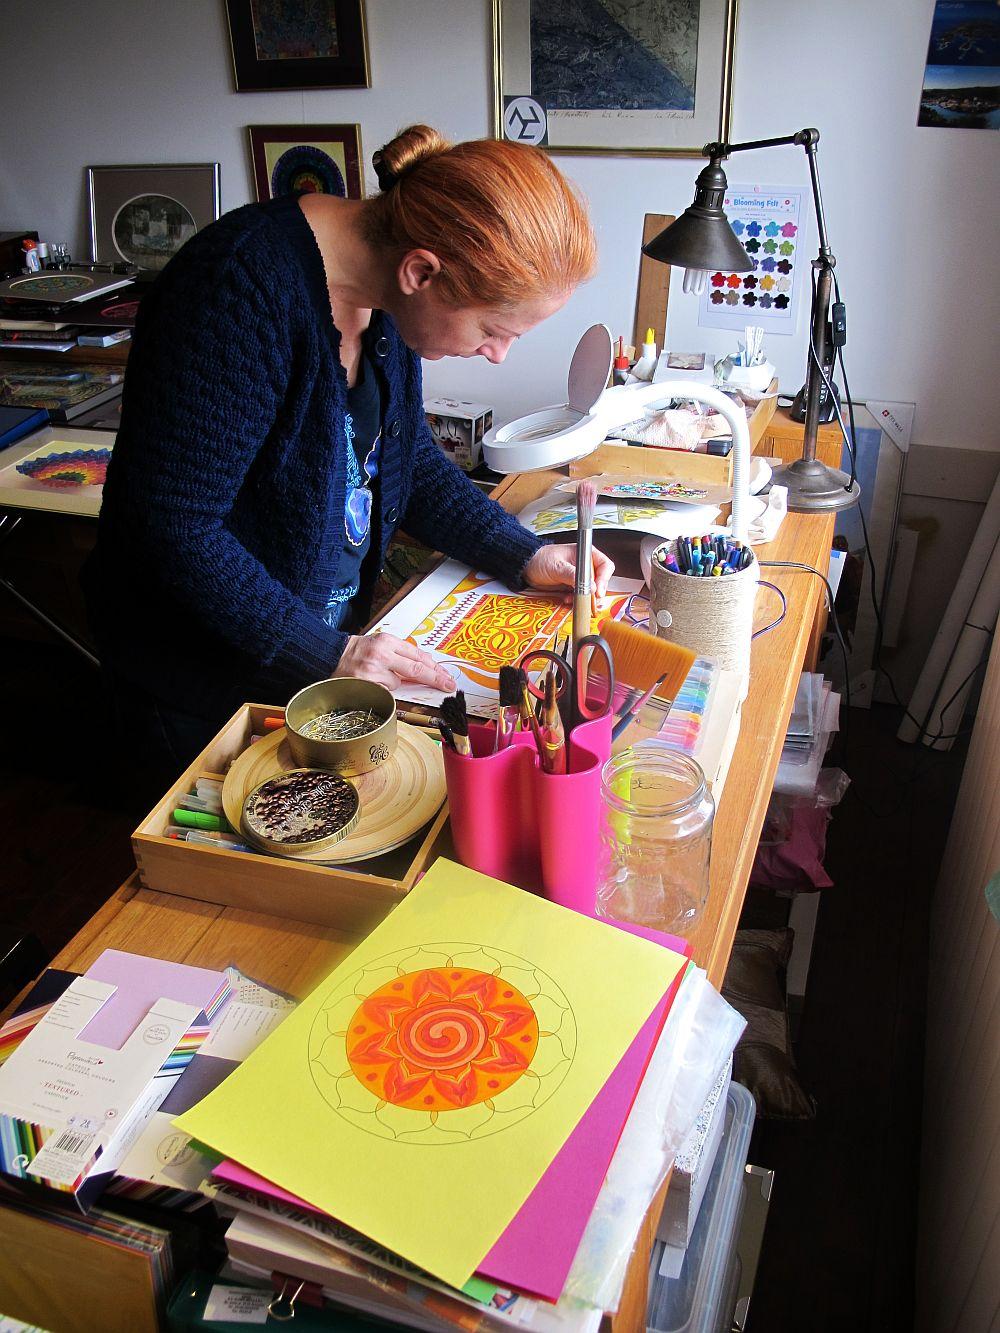 adelaparvu.com about Ioana Dominte artist (19)